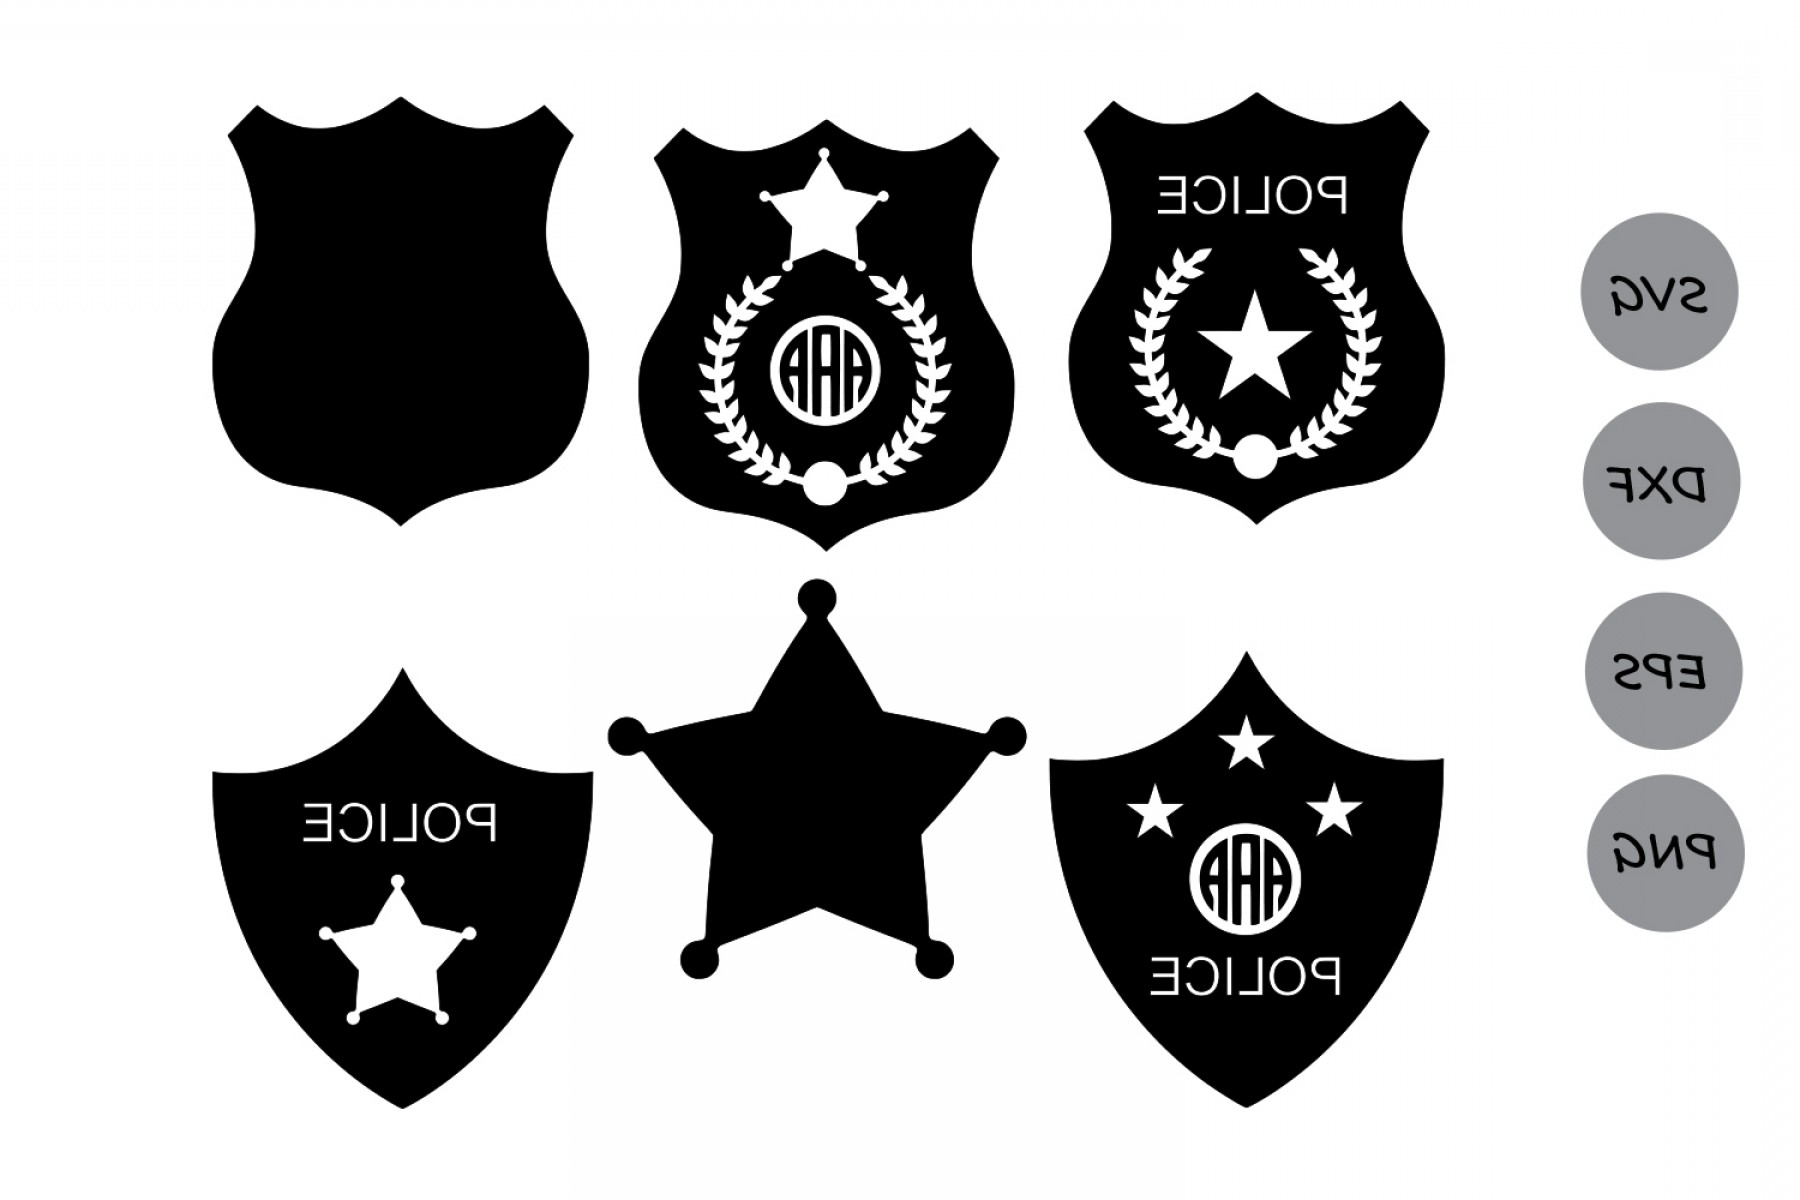 1800x1200 Police Badge Svg Police Svg Police Badge Monogram Svg Sheriff Svg